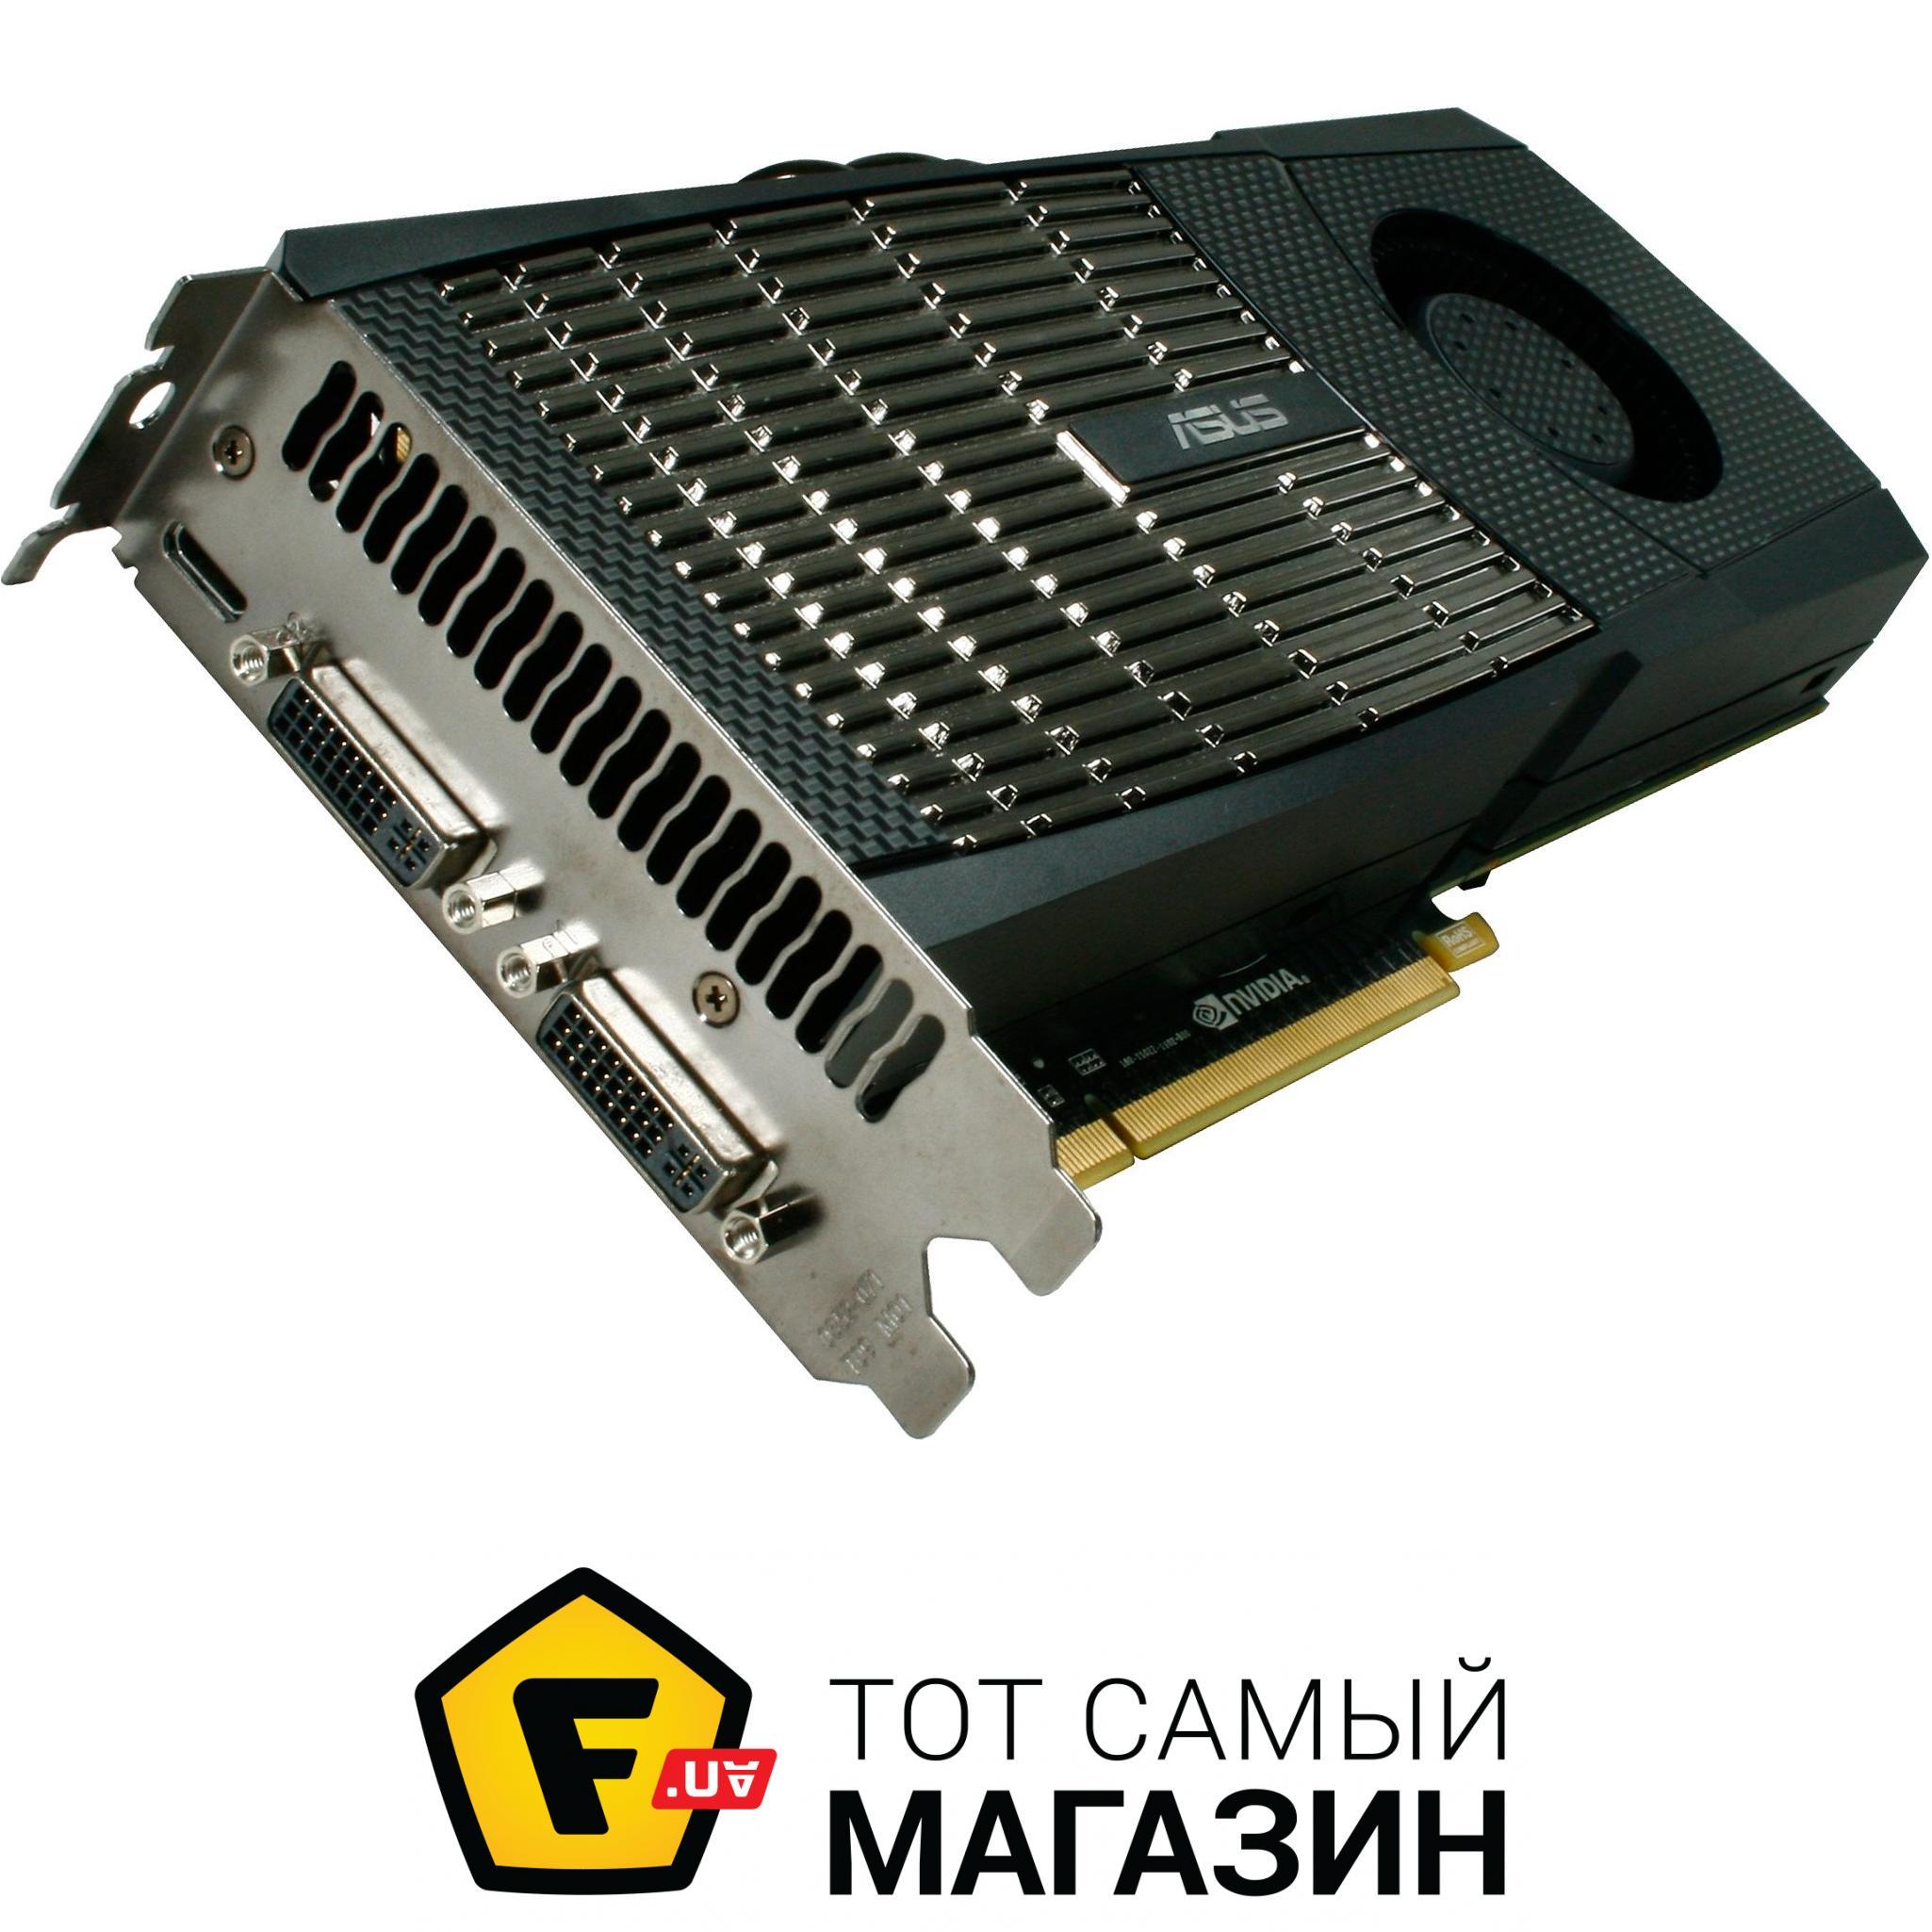 ASUS GEFORCE GTX480 ENGTX480G2DI1536MD5 WINDOWS VISTA DRIVER